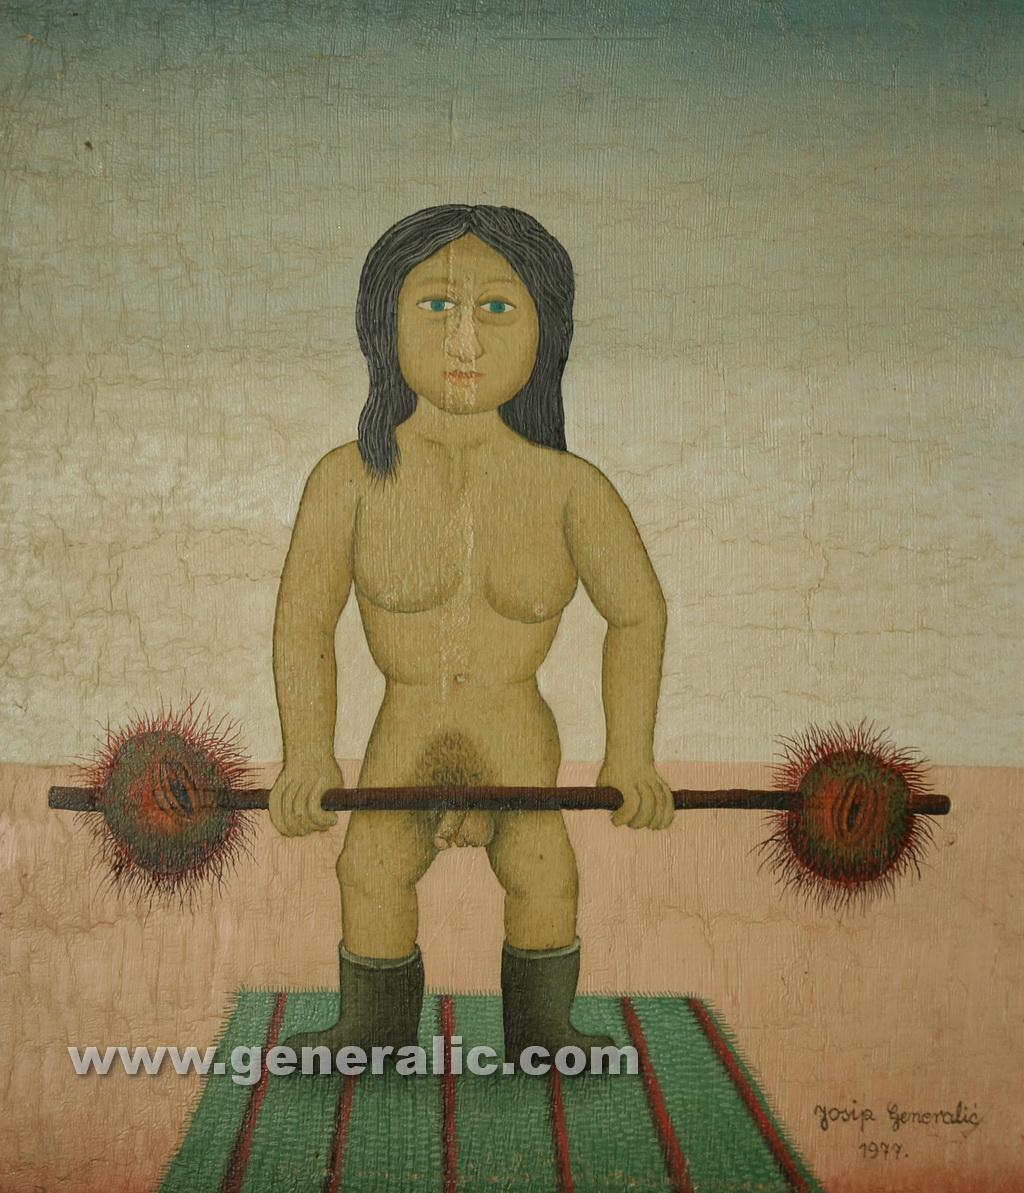 Josip Generalic, 1977, Mutant body builder, oil on canvas, 36x31 cm